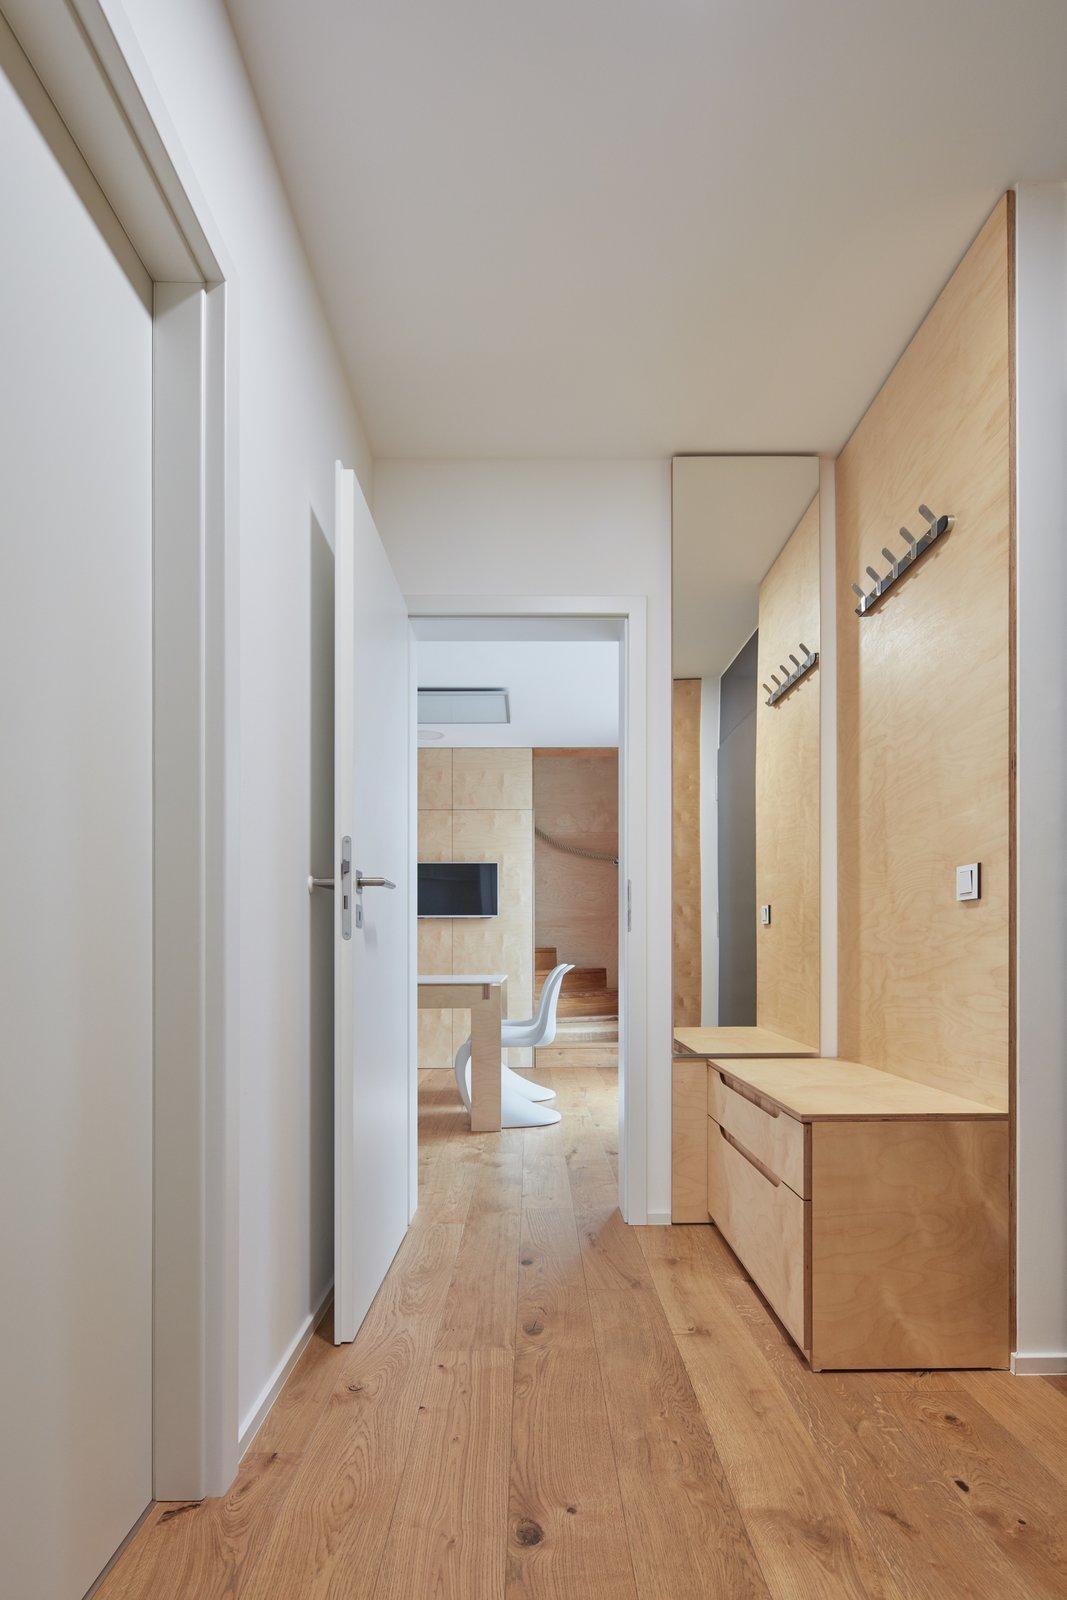 Hallway and Medium Hardwood Floor  Freedomek No.061 by BoysPlayNice Photography & Concept